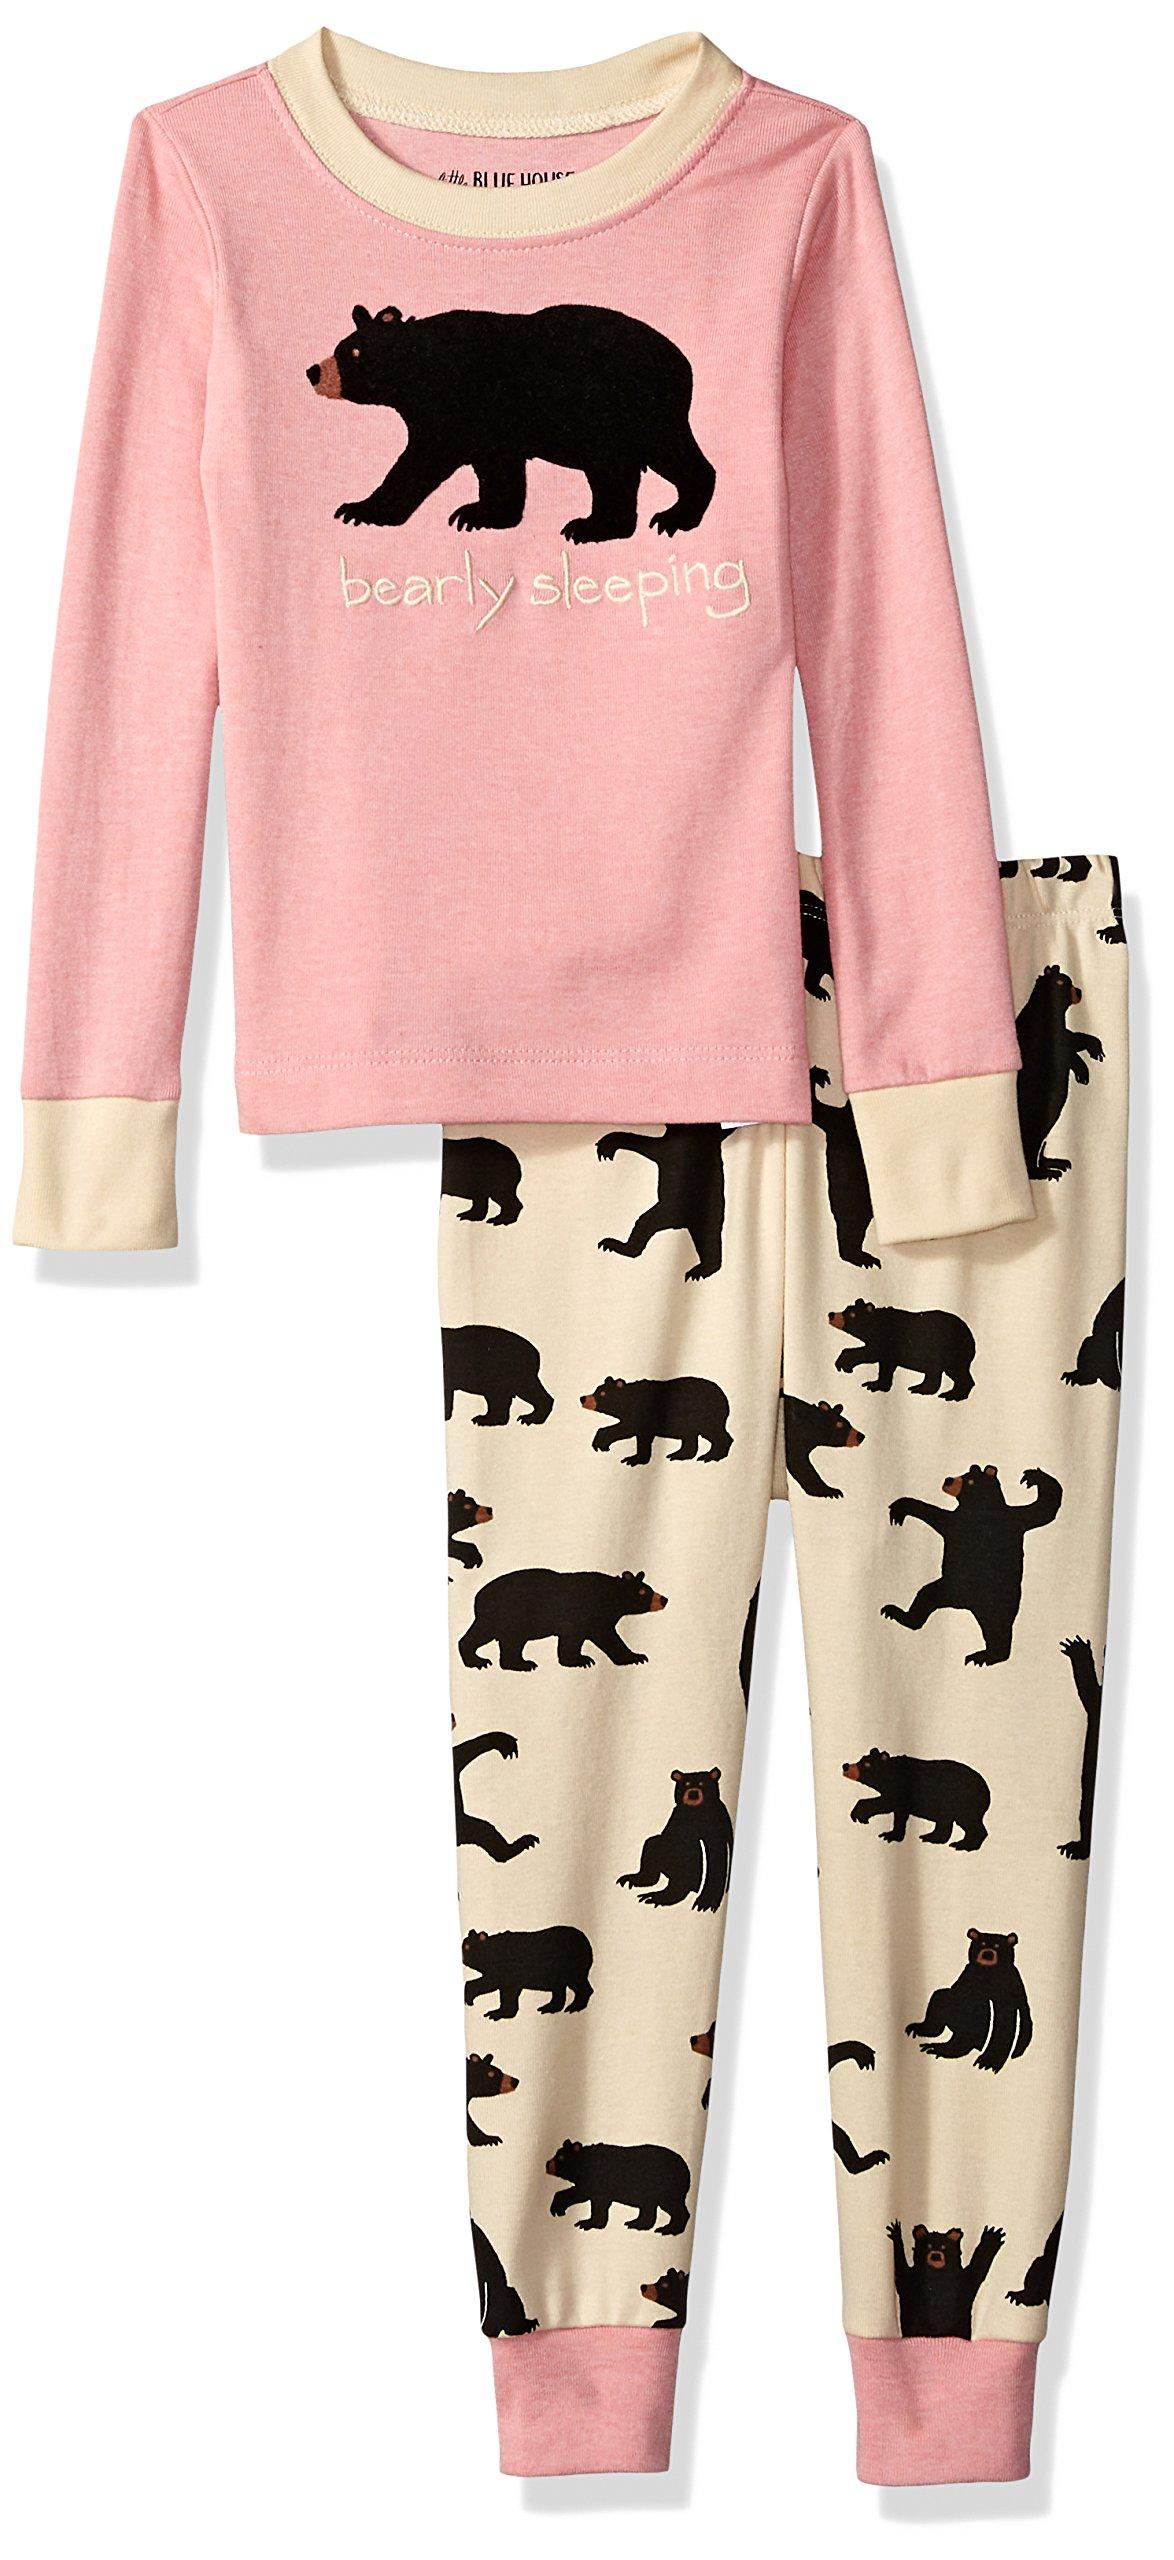 Little Blue House by Hatley Big Kids Bear Family Pajamas, Kid's Long Sleeve Pajama Set/Black Bear on Pink/Bearly Sleeping, 10 Years